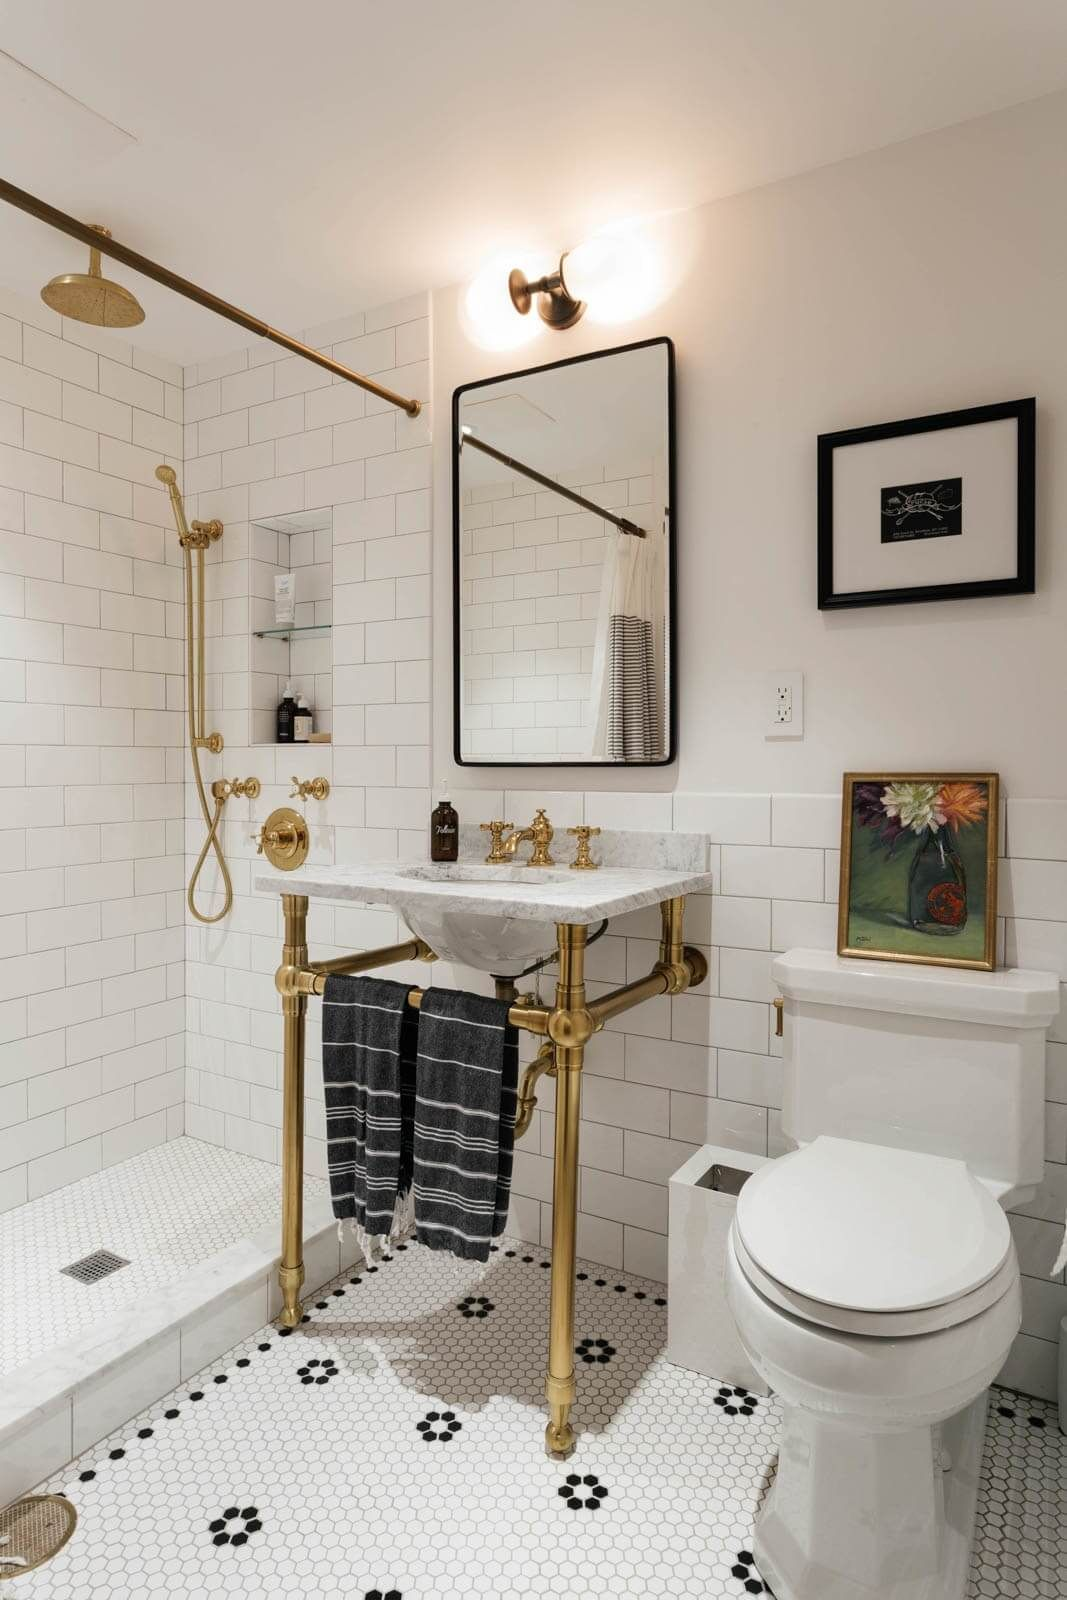 Interior Design Ideas Brooklyn Emma Beryl Greenpoint Small Bathroom Decor Bathroom Interior Design Bathroom Interior